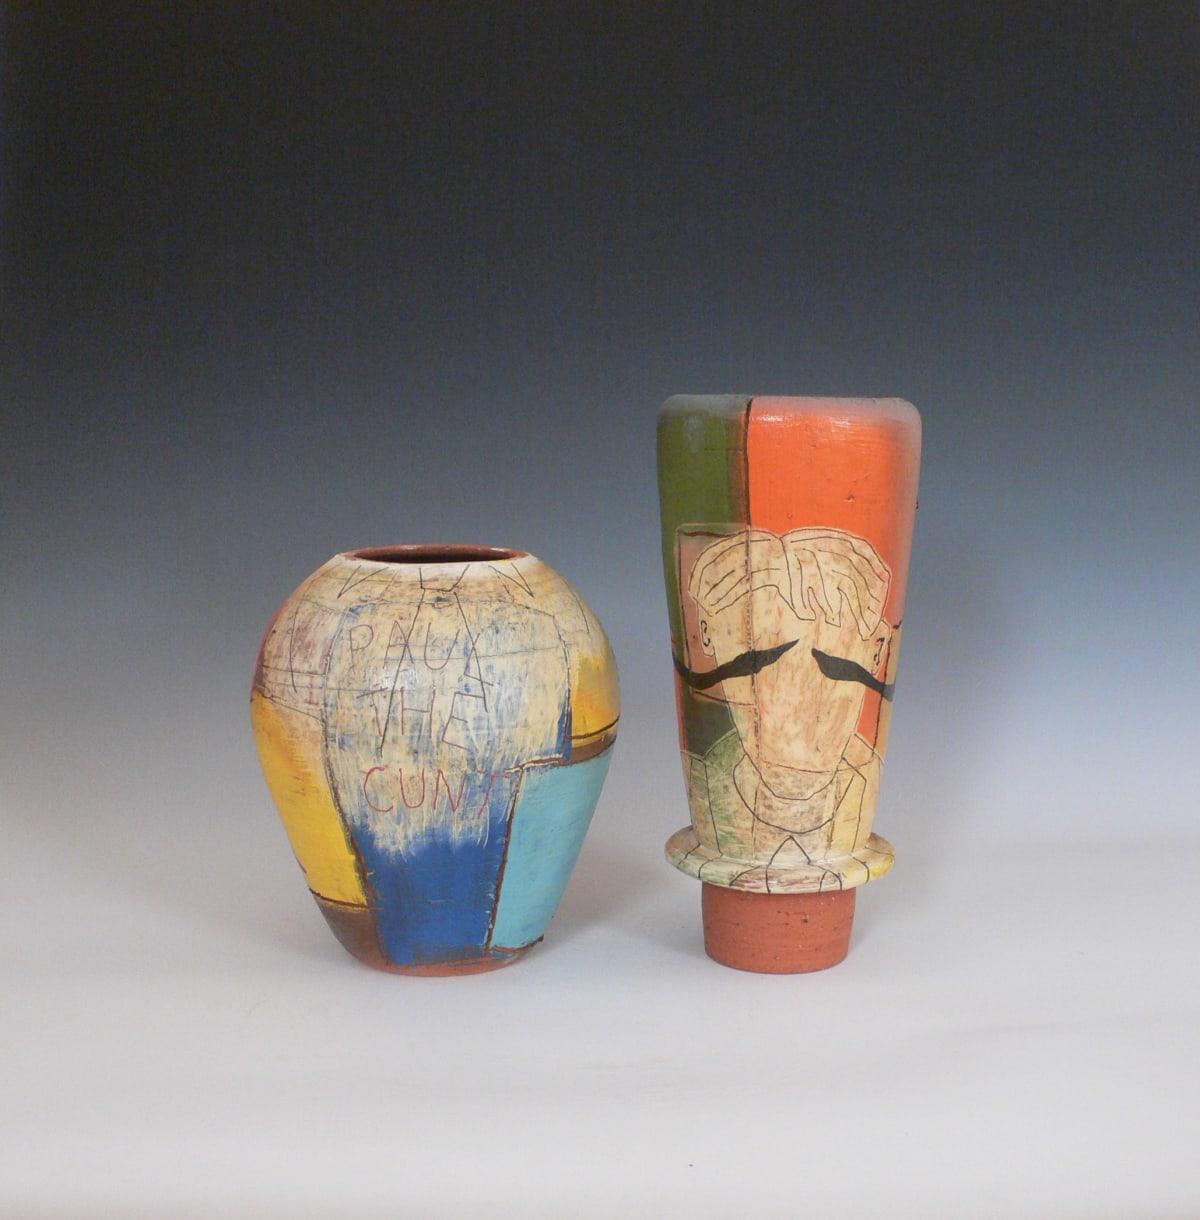 Paul Maseyk Paul the Cunt , 2018 clay, slip, glaze - wood kiln firing 480mm x 200mm x 200mm